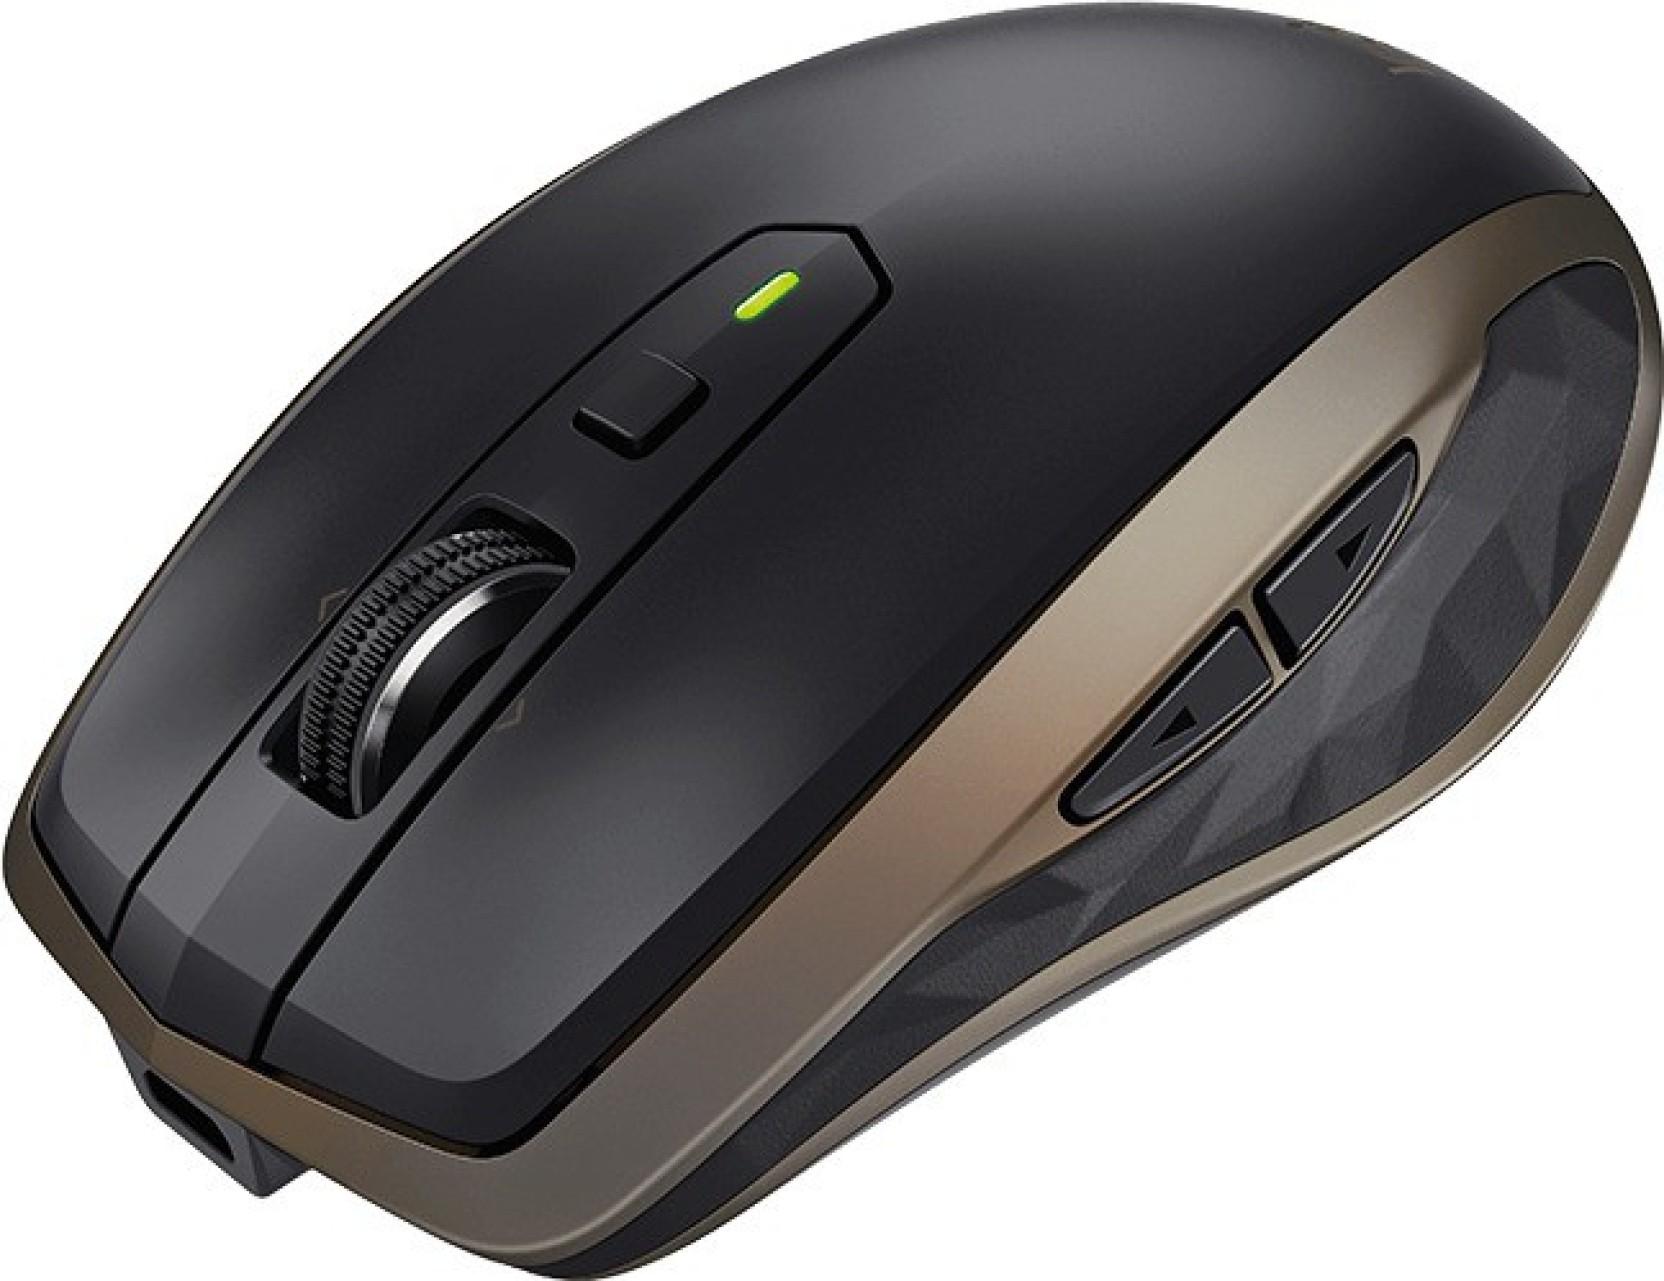 Info Harga Hot Deals Logitech M331 Silent Wireless Mouse Hitam Baru Garansi Resmi Original Mx Anywhere 2 Optical Share